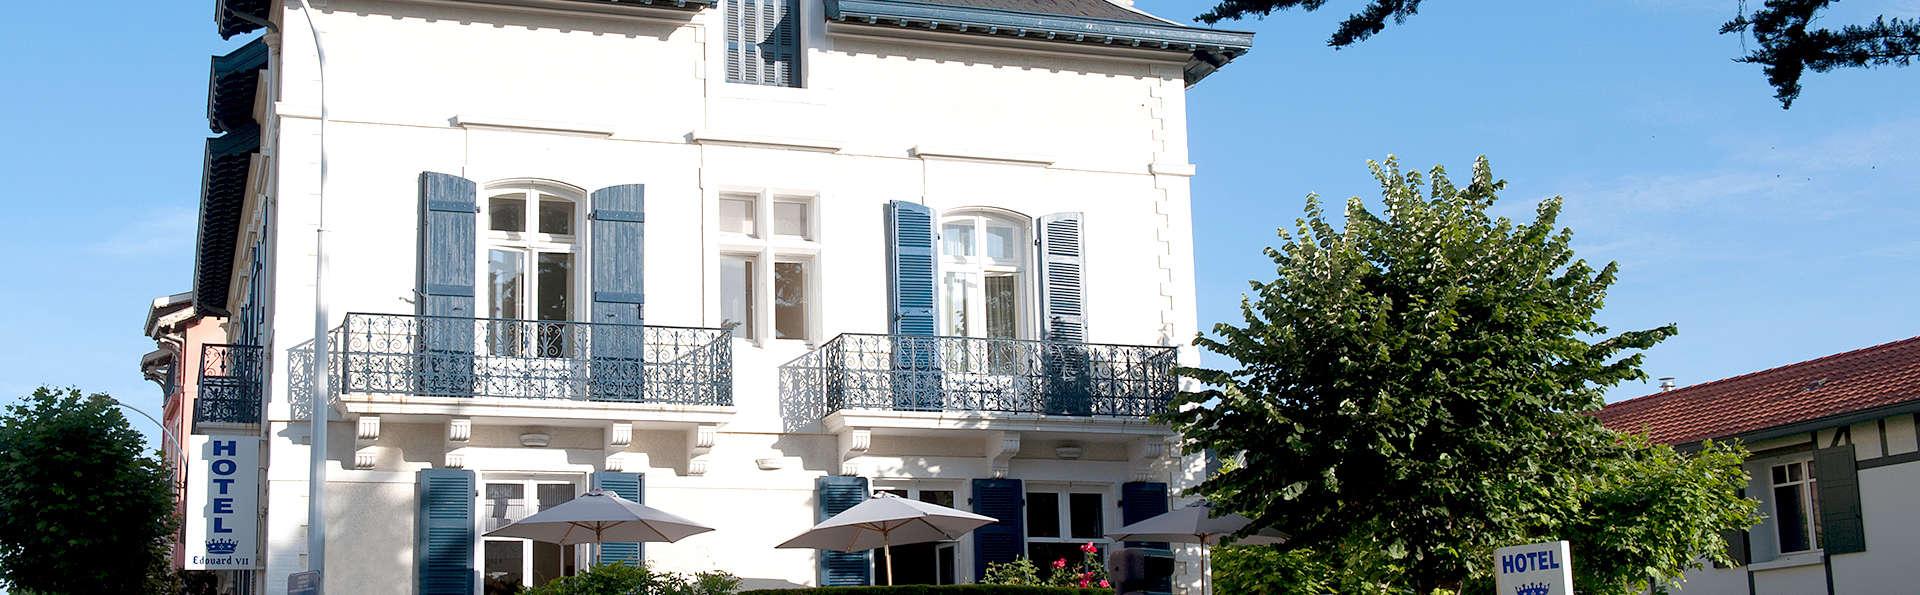 Hôtel Edouard VII Biarritz - Edit_Front.jpg